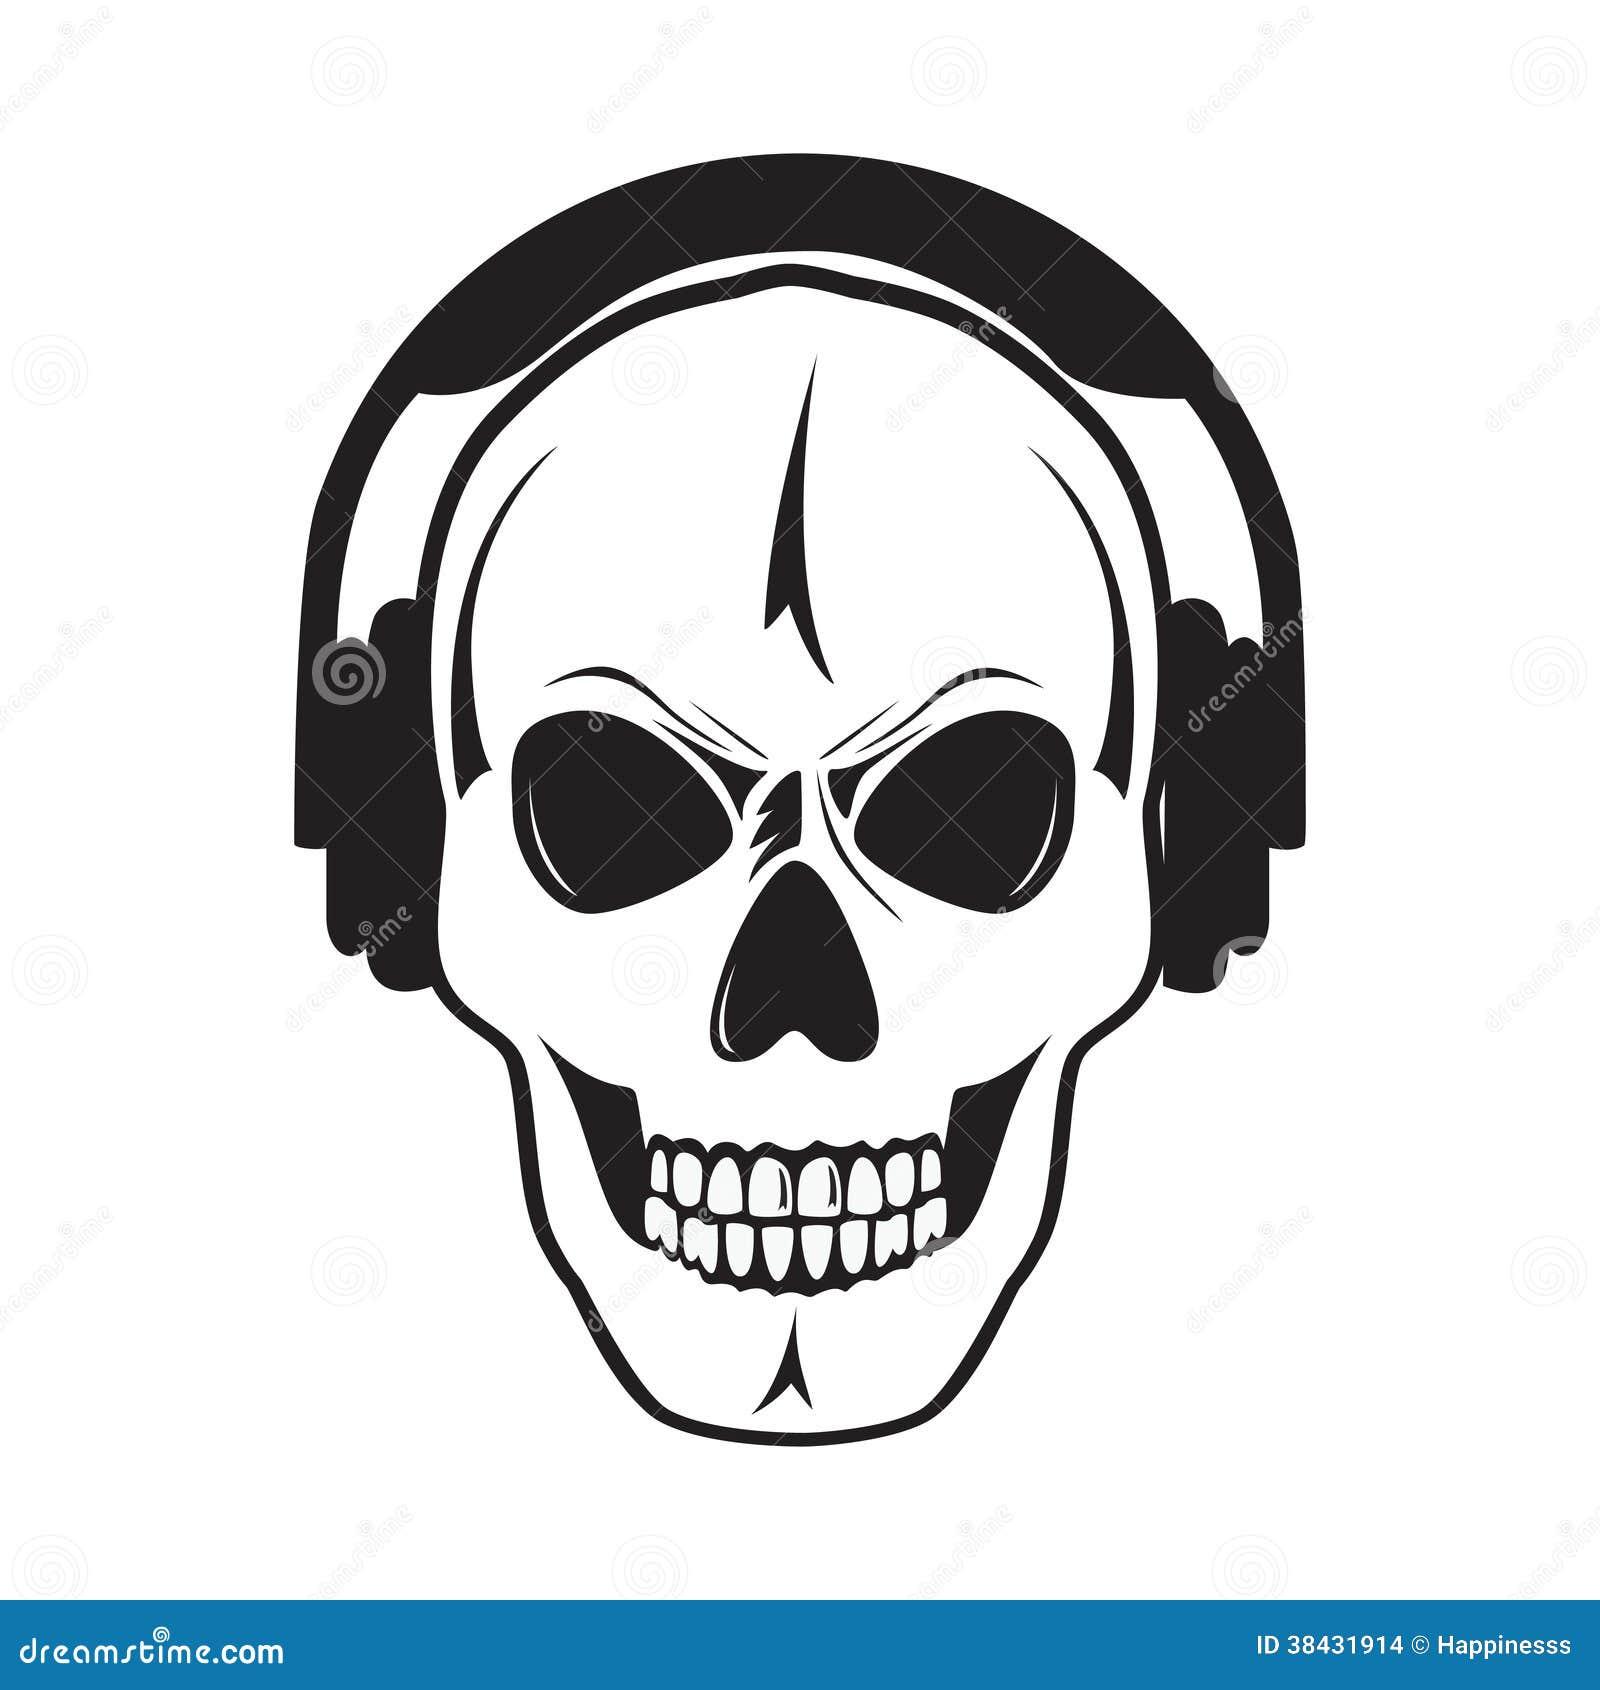 197d54fee05 Jolly Skull With Headphones. Isolated Object.? Stock Vector ...